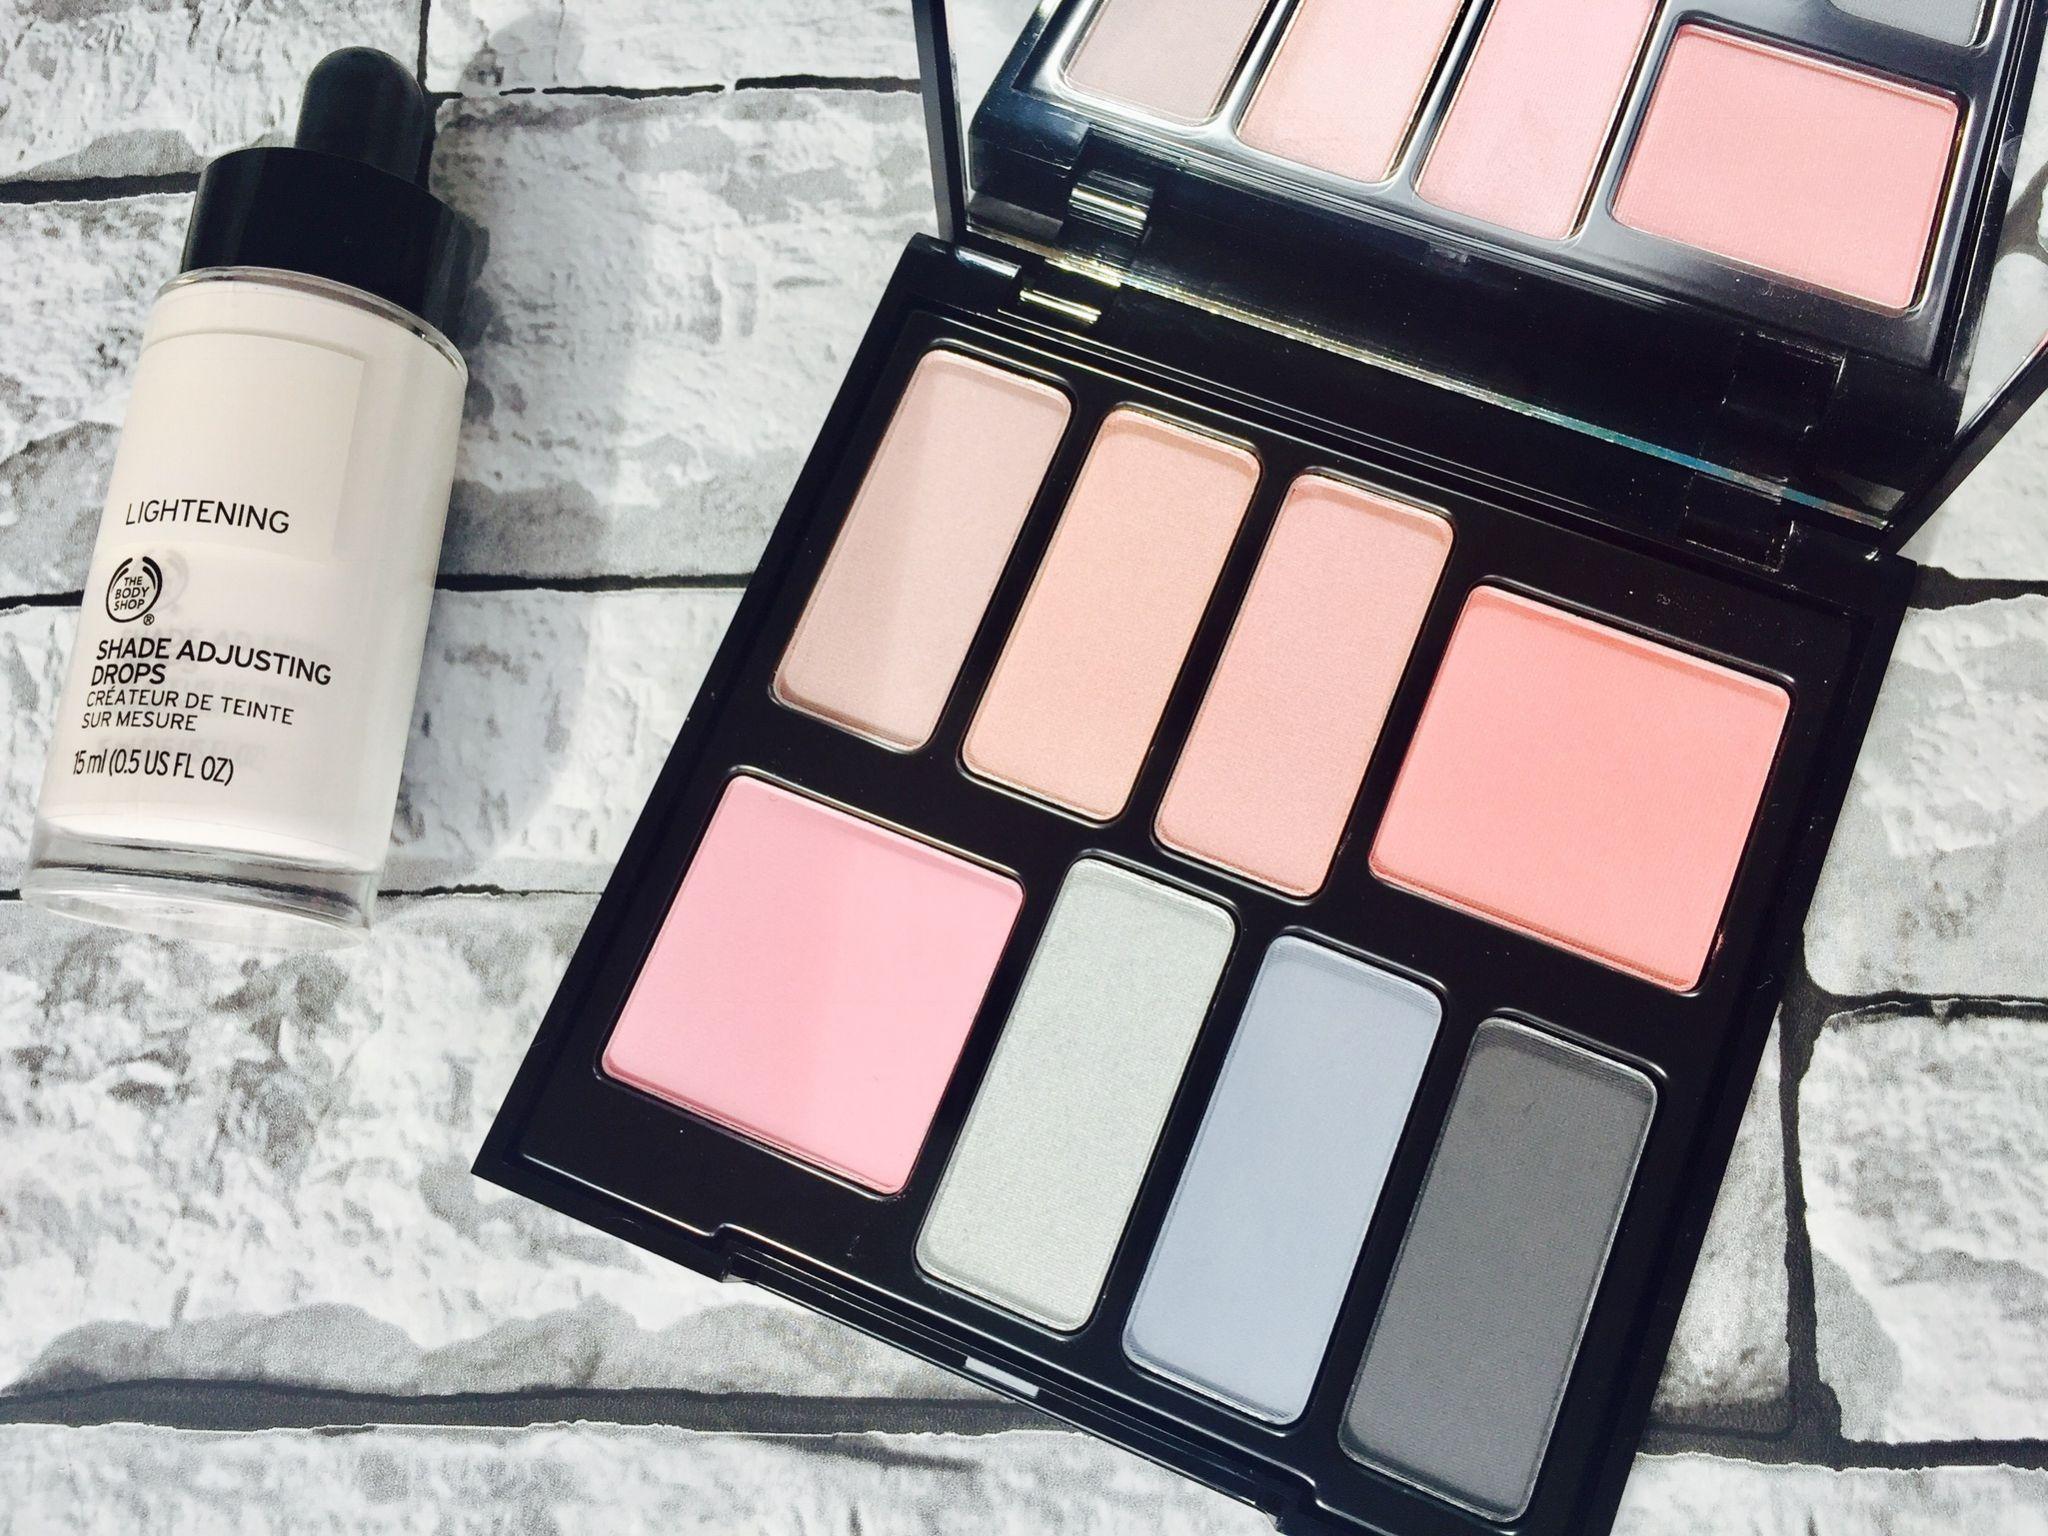 The Body Shop Shade Adjusting Drops Lightening British Rose Palette